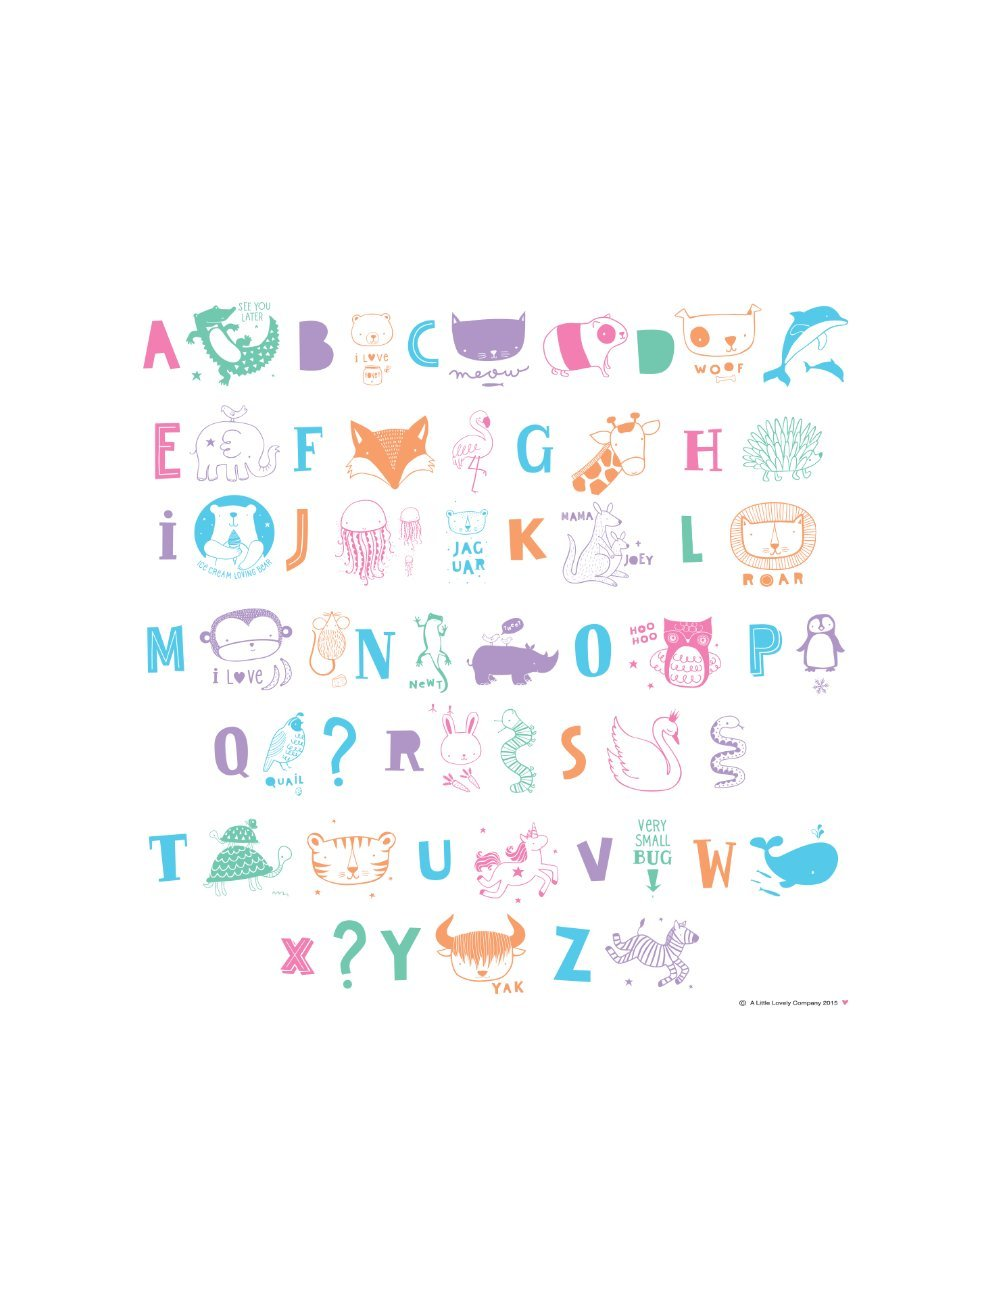 A Little Lovely Company 171-016 - Letras y símbolos